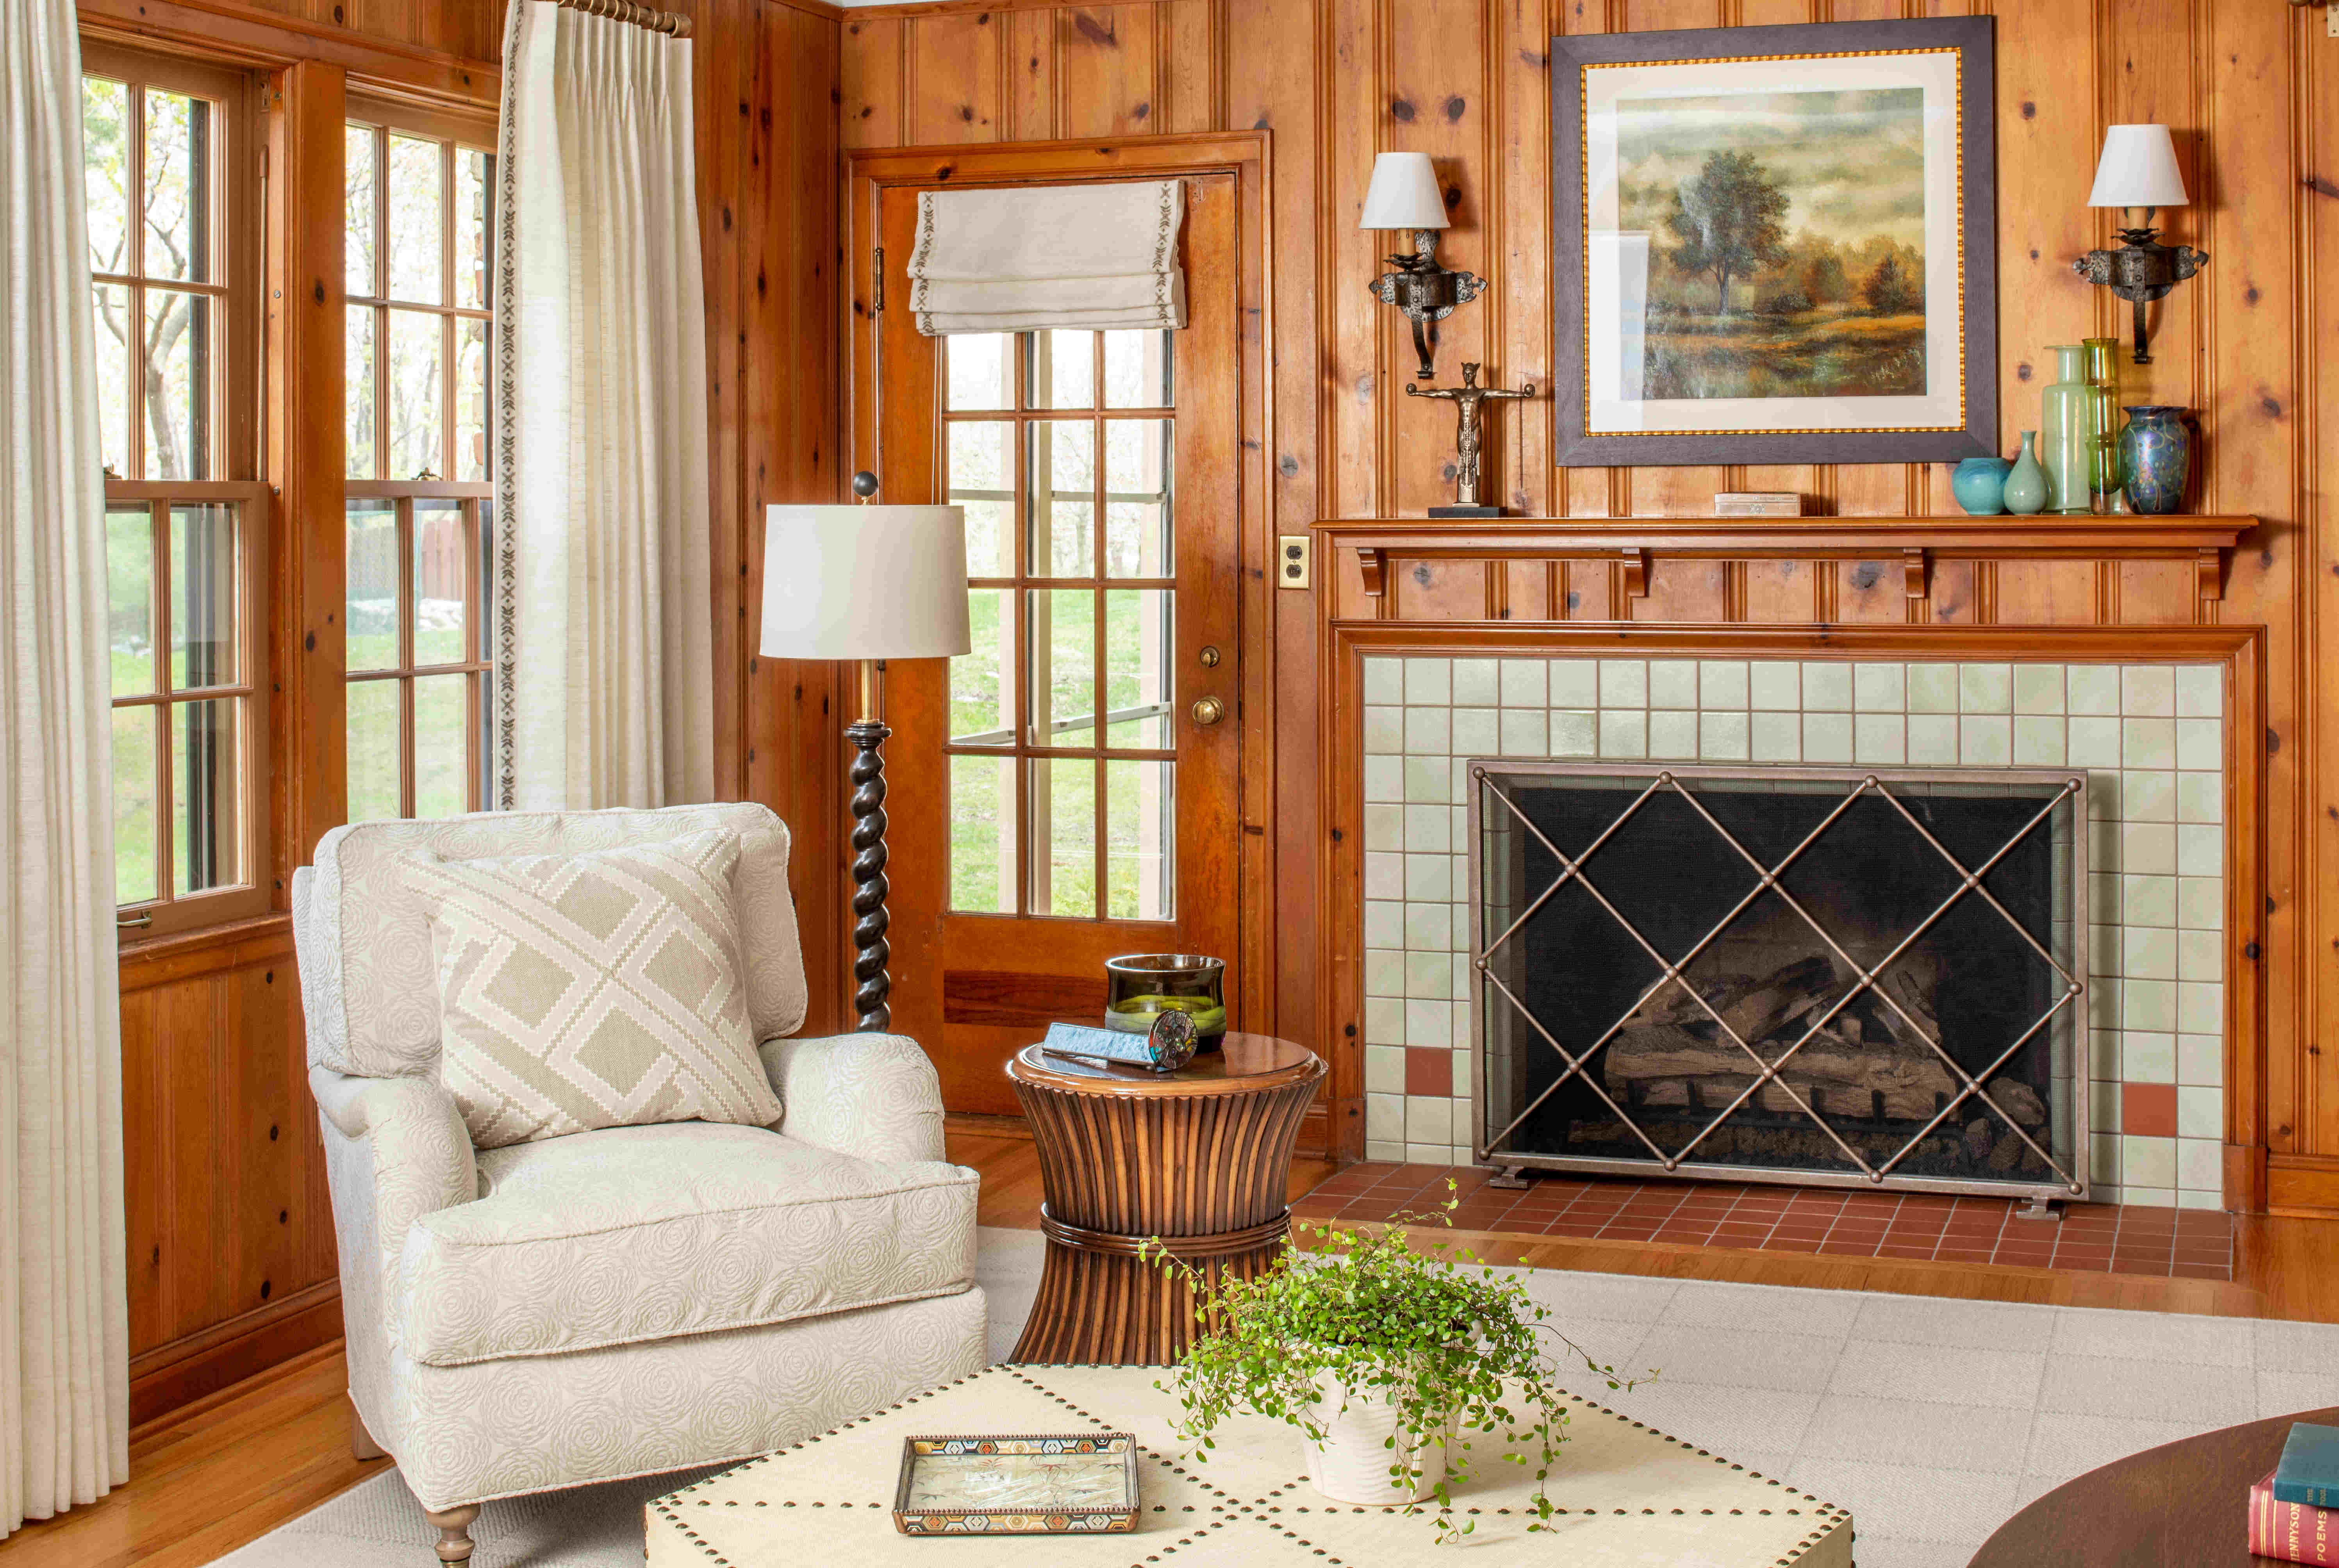 Homey wood-paneled living room with fireplace and light colored furnishings. Minnetonka Charmer.